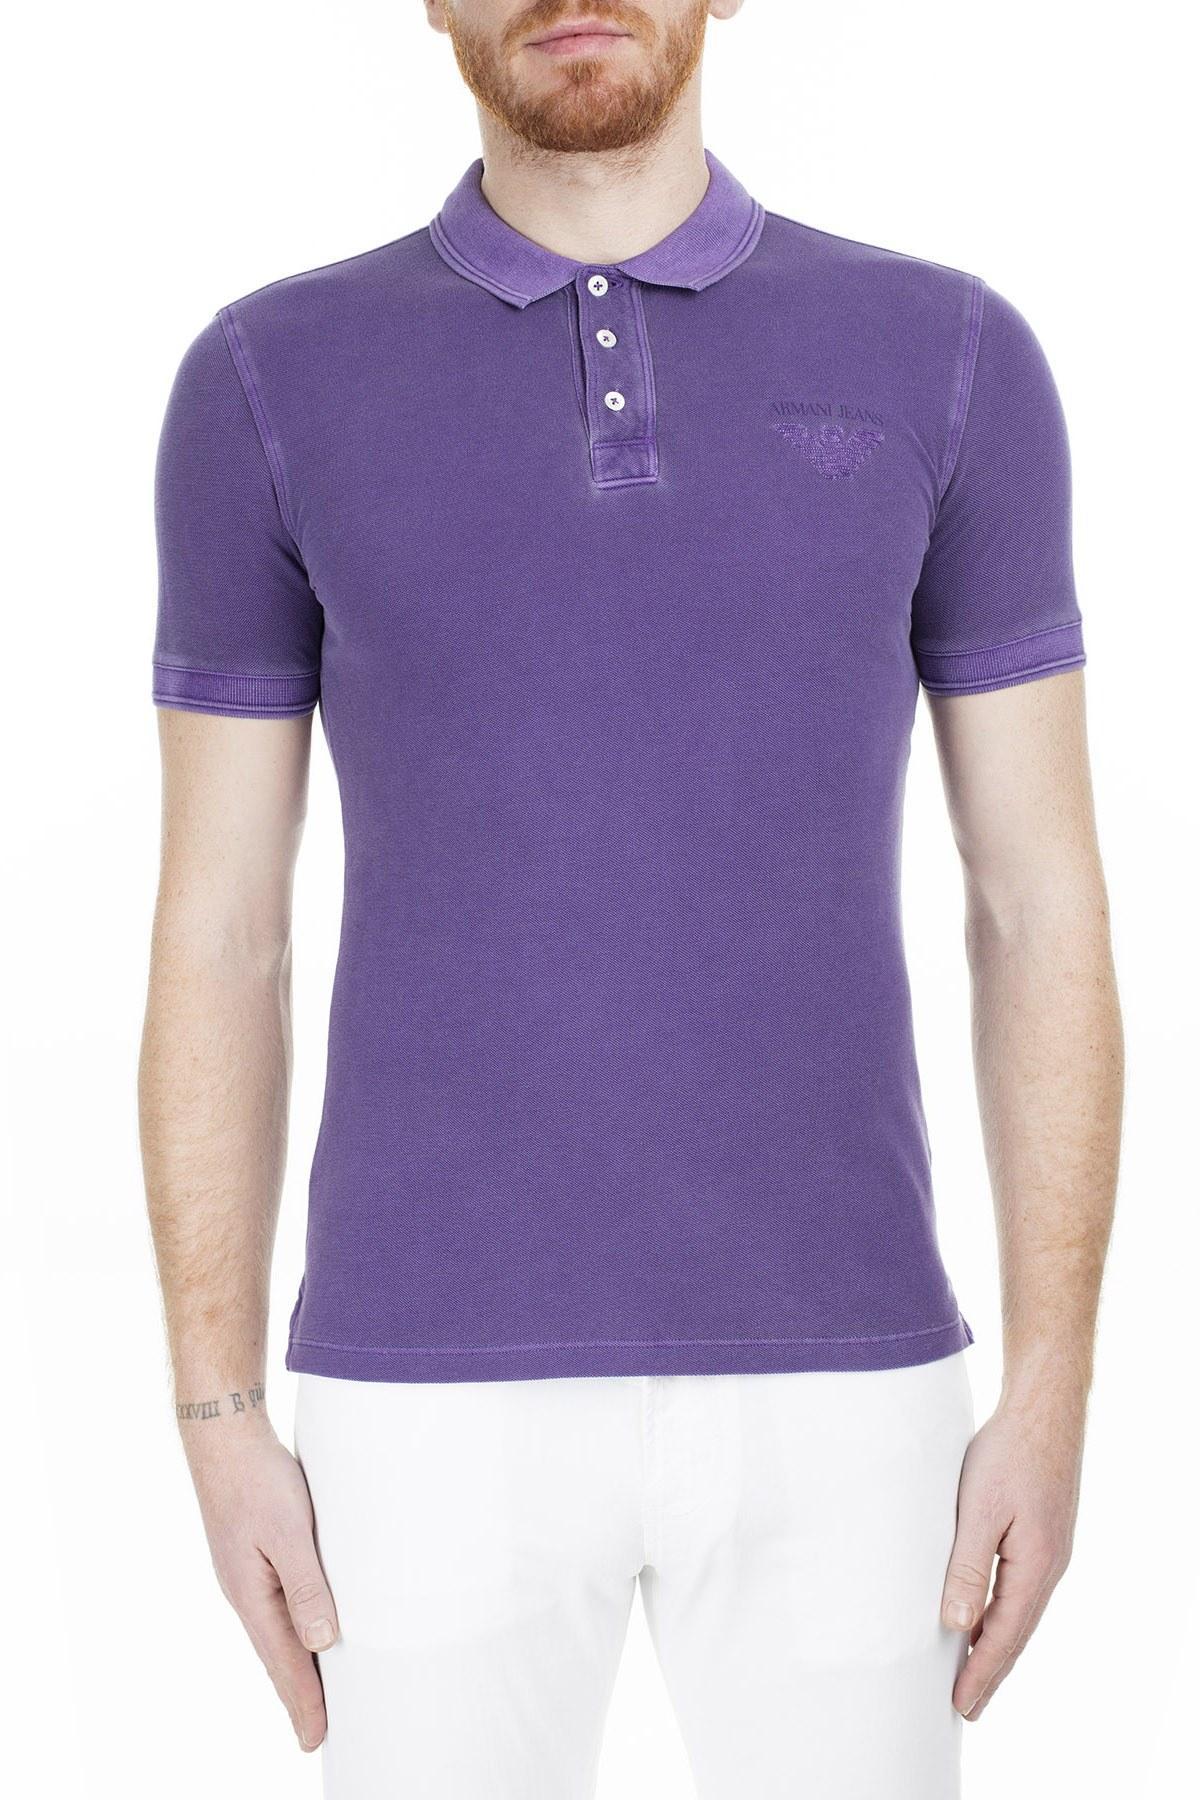 Armani Jeans Erkek T Shirt 3Y6F03 6J0JZ 1301 MÜRDÜM